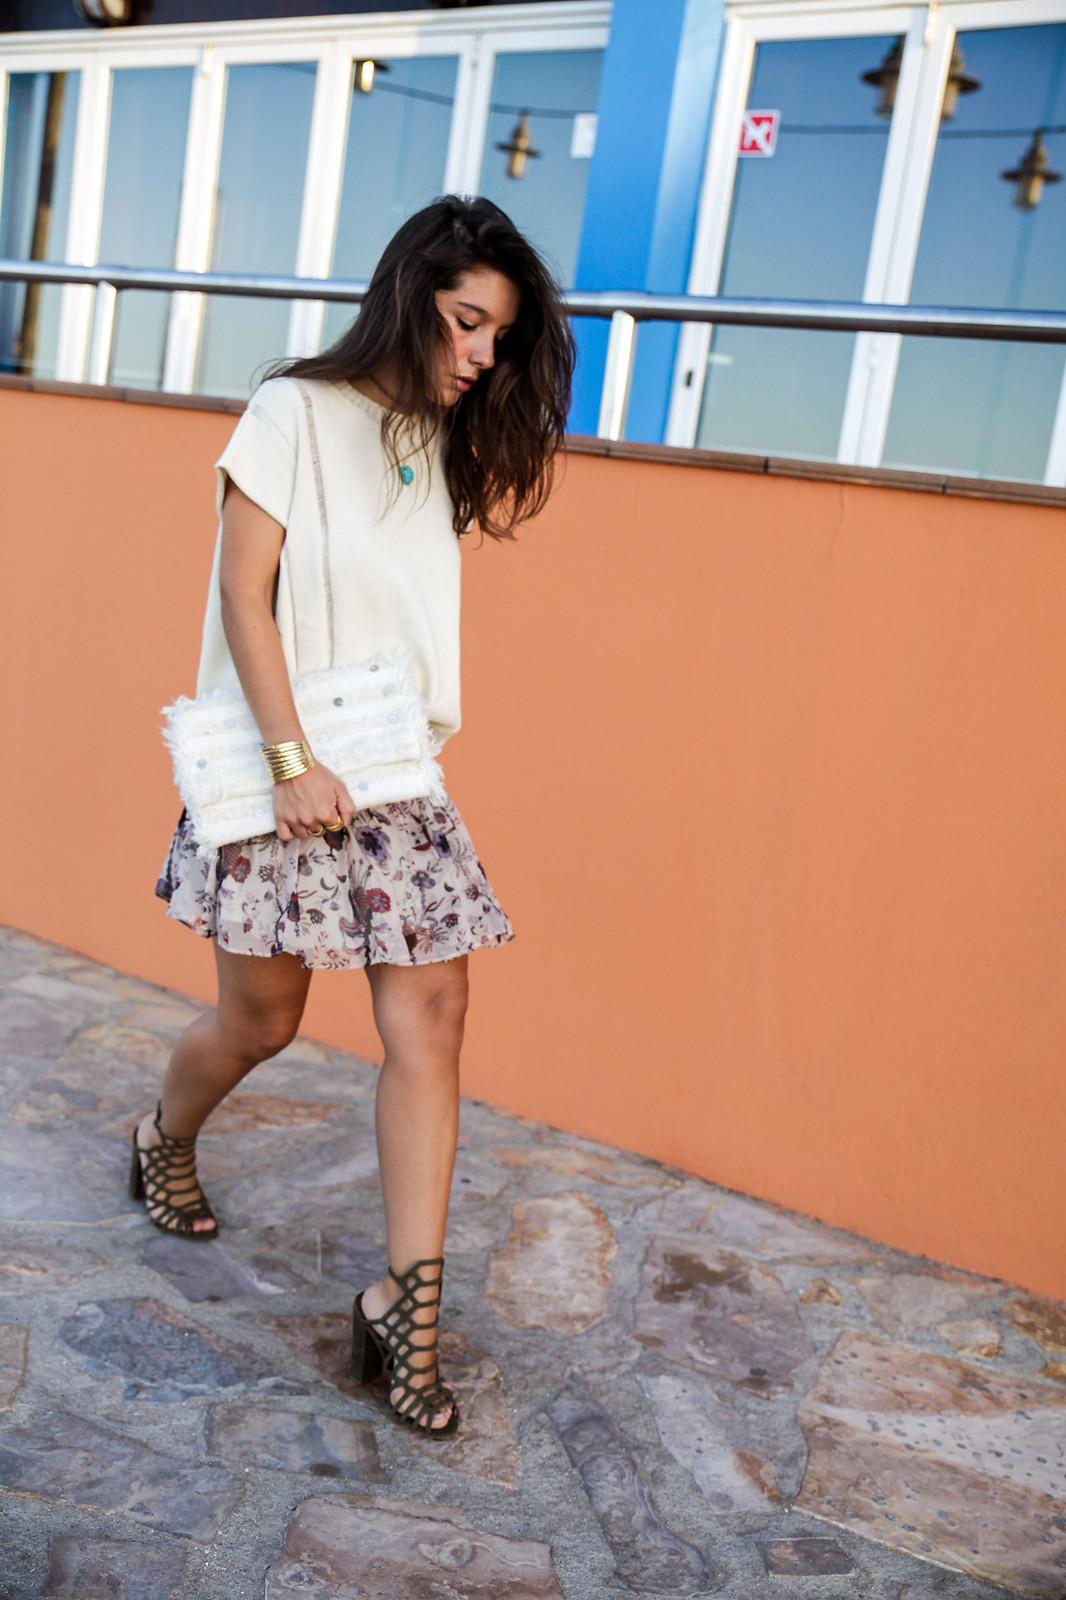 07_blusa_punto_falda_flores_summer_outfit_theguestgirl_rüga_schade_jewels_steve_madden_.magali_pasacal_influencer_barcelona_blogger